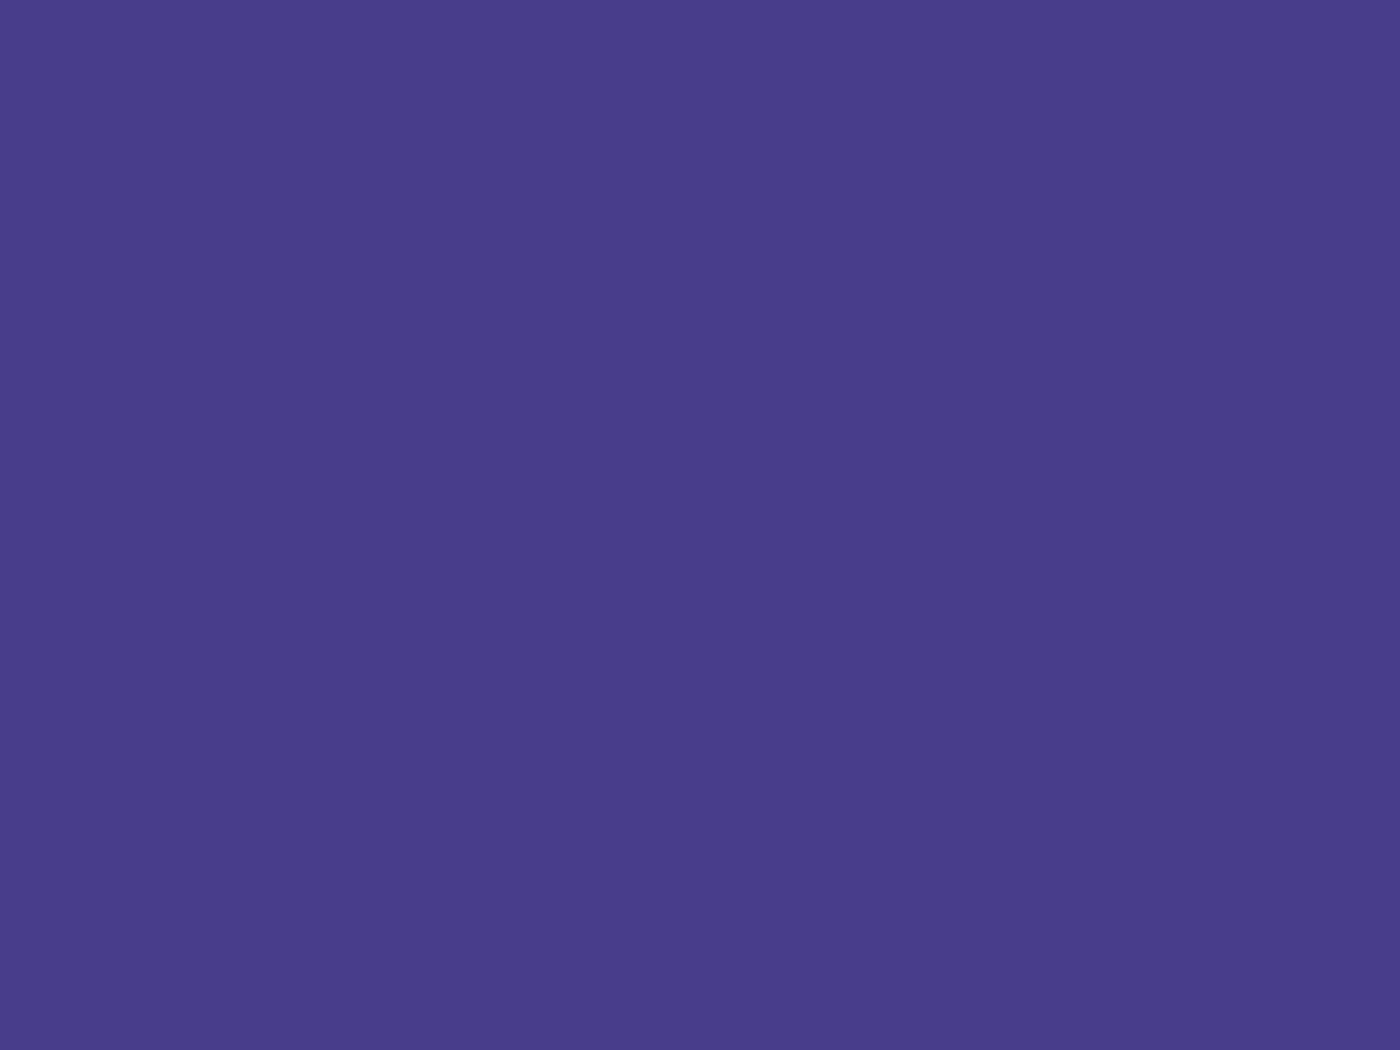 1400x1050 Dark Slate Blue Solid Color Background